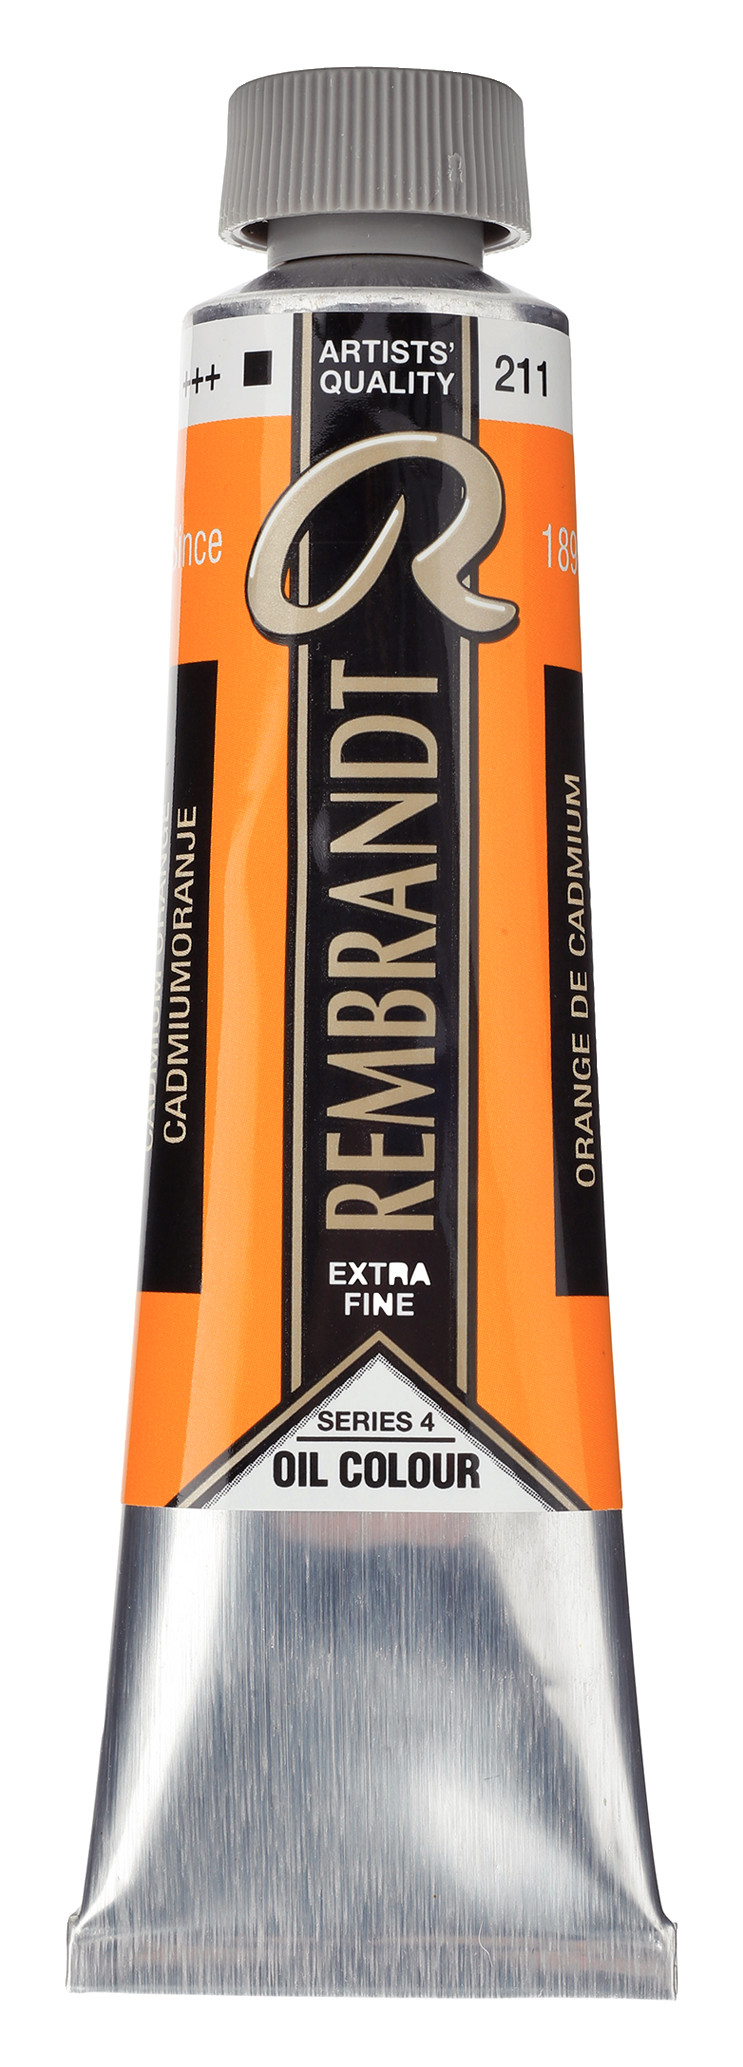 Rembrandt Oil colour Paint Cadmium Orange (211) 40ml Tube